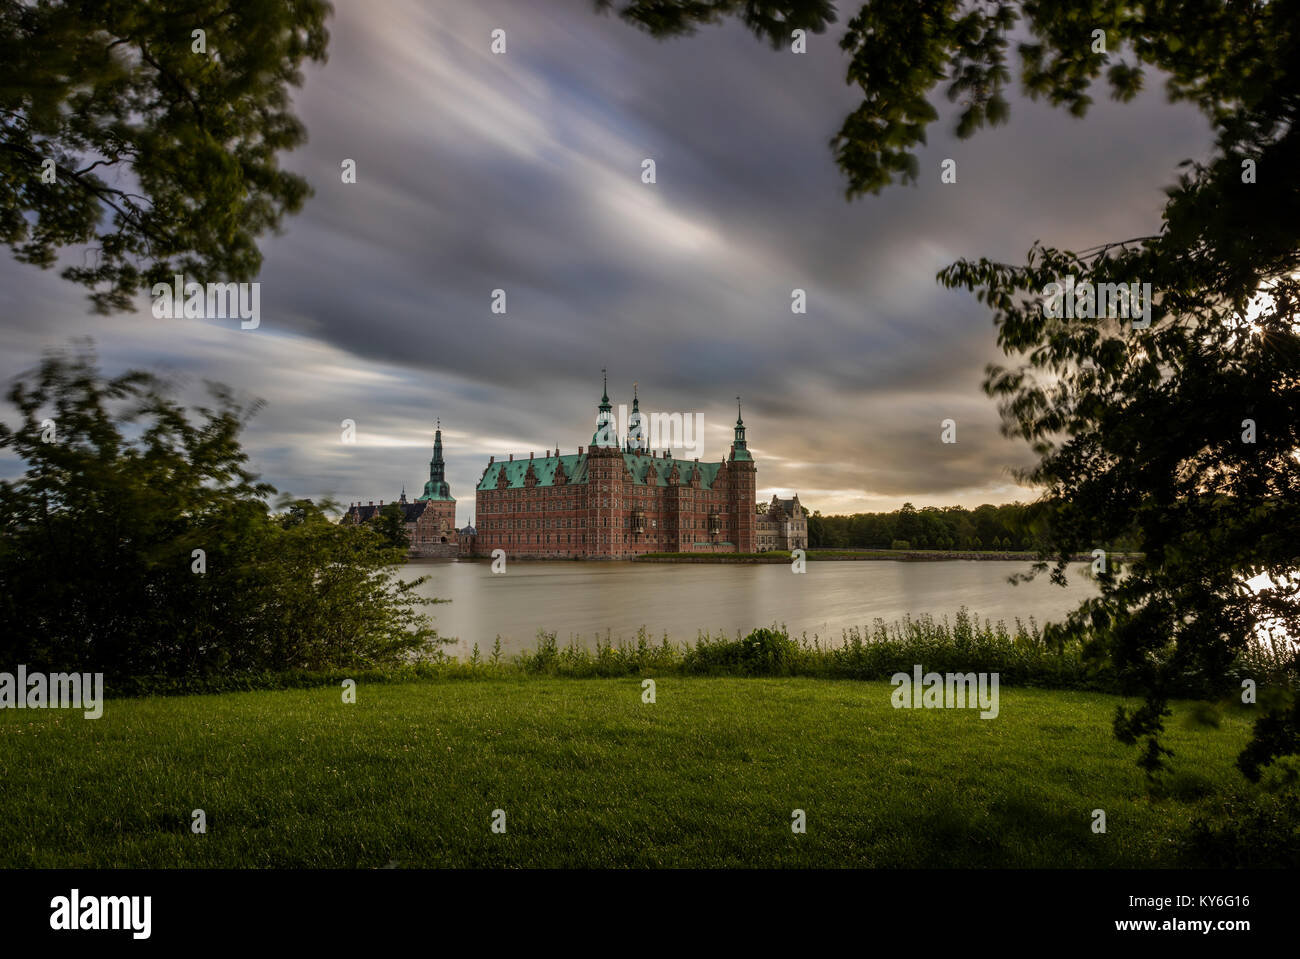 Frederiksborg Castle in Hillerod, Denmark - Stock Image